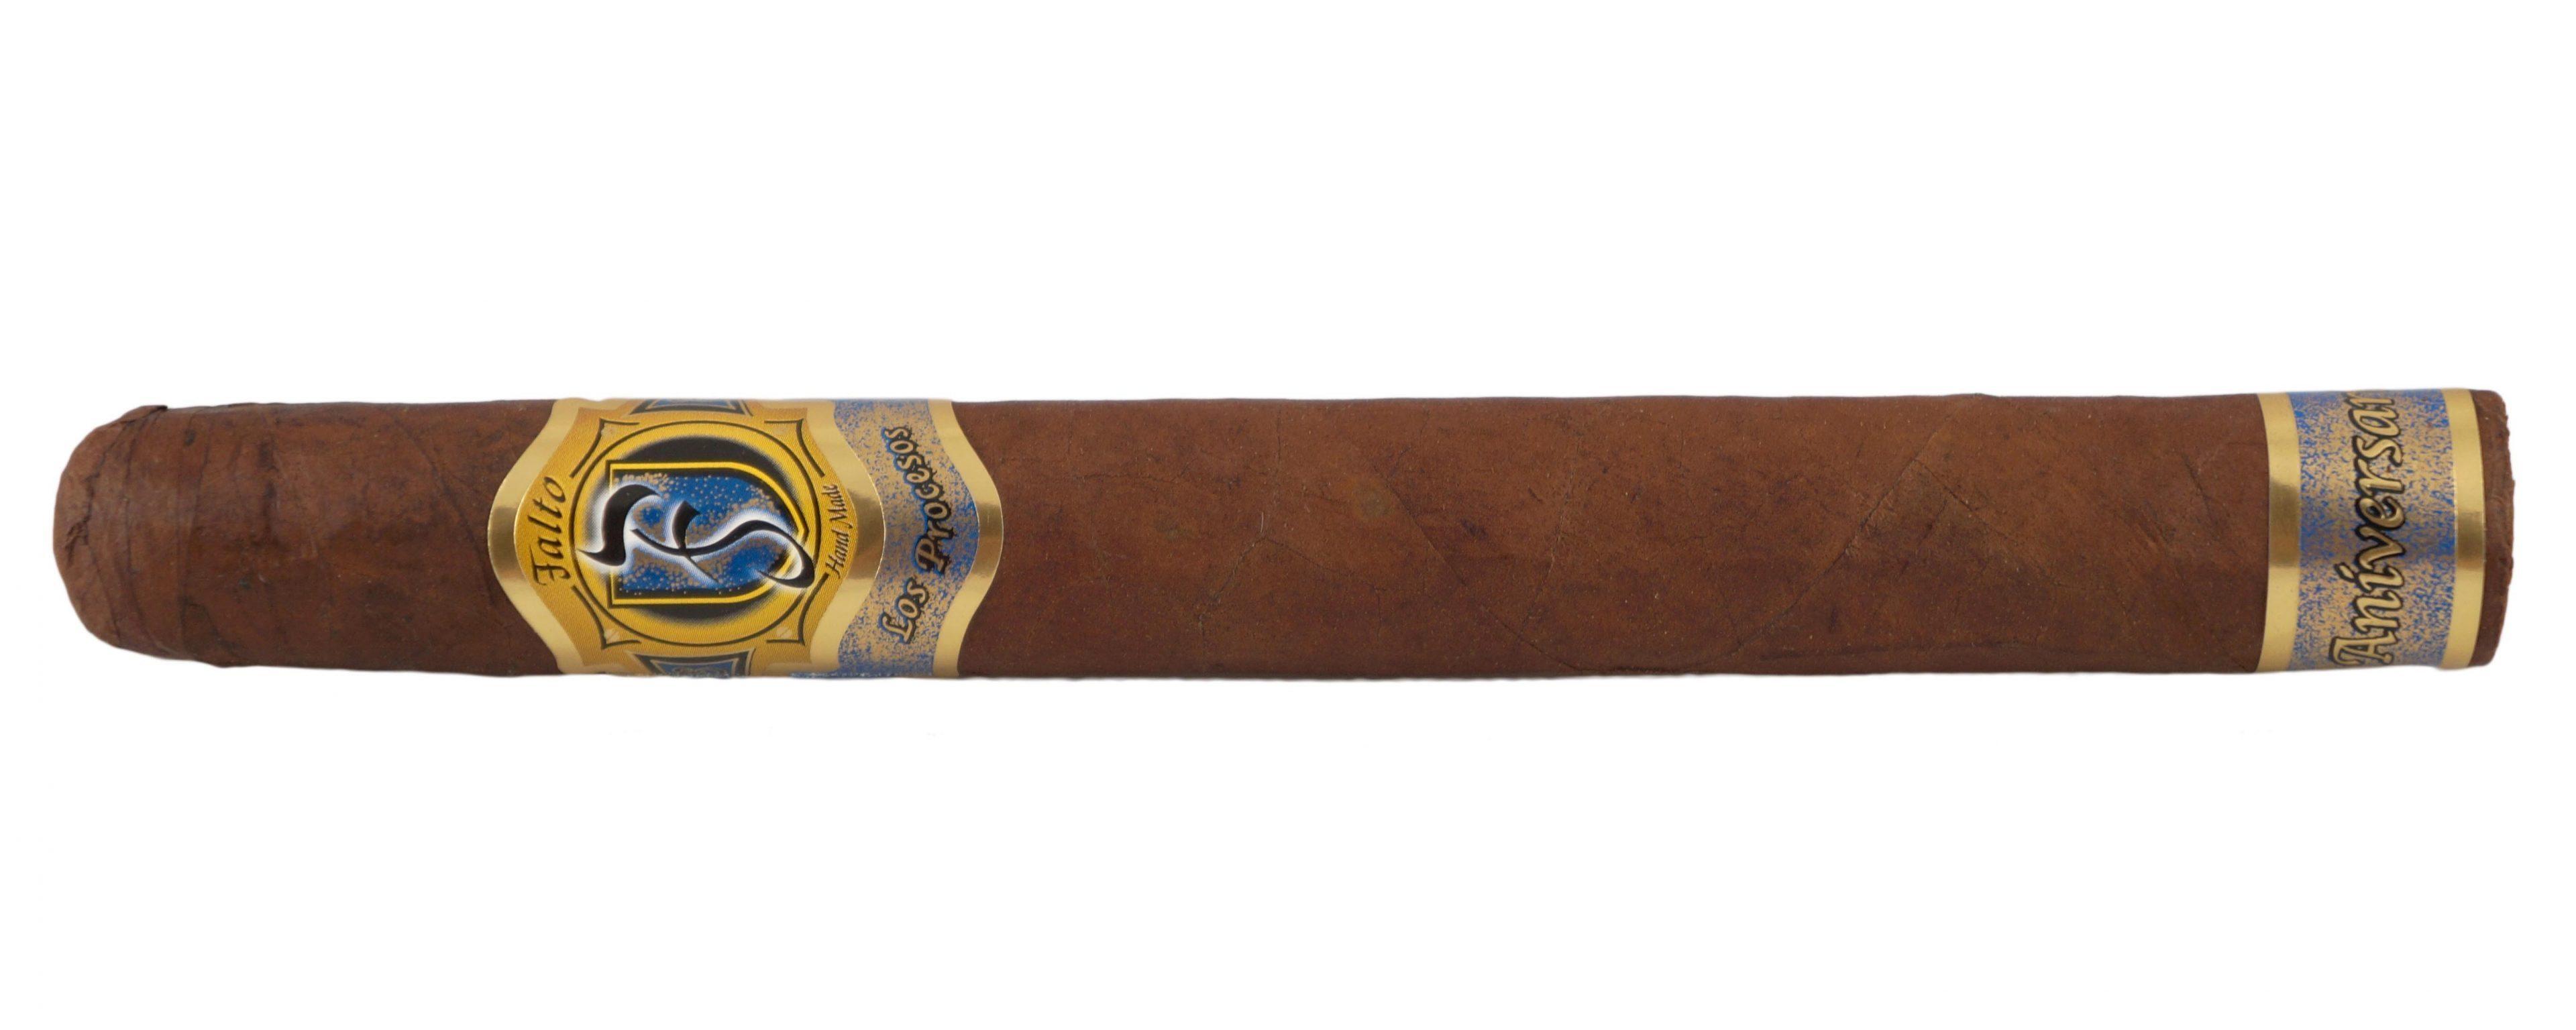 Blind Cigar Review: Falto | 20th Anniversary Los Procesos